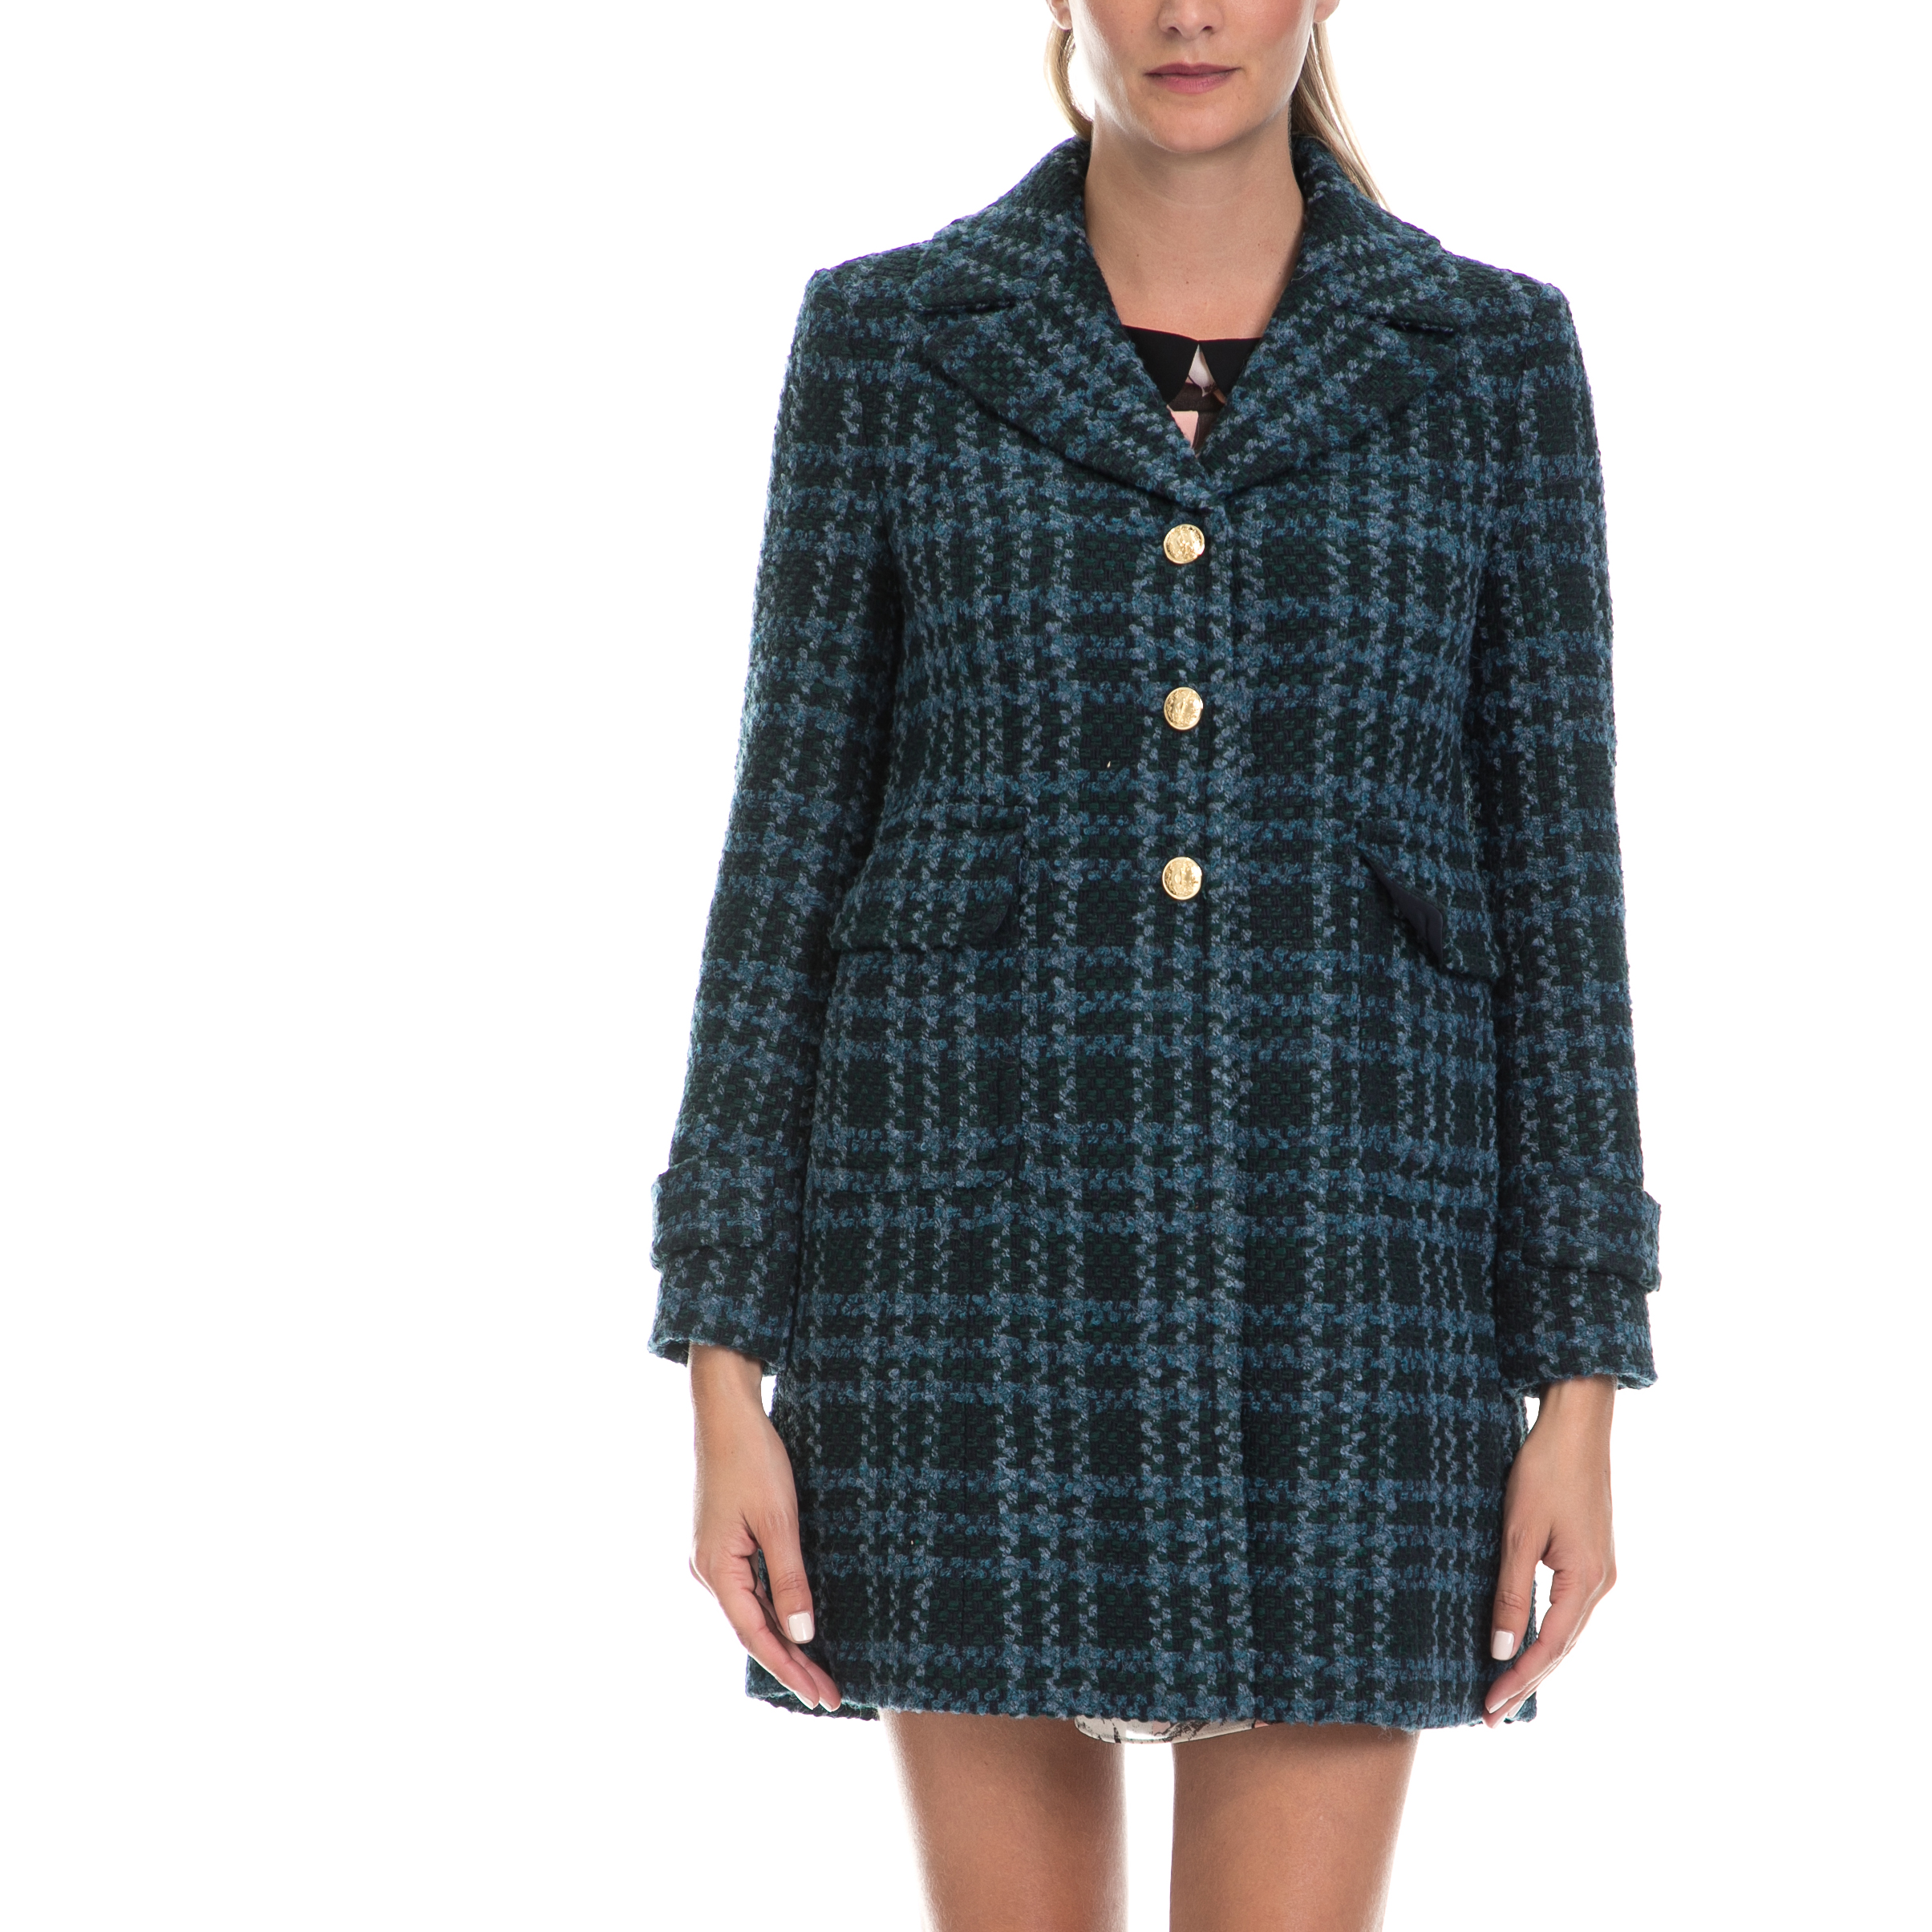 JUICY COUTURE - Γυναικείο παλτό BASKETWEAVE PLAID COAT πράσινο γυναικεία ρούχα πανωφόρια παλτό